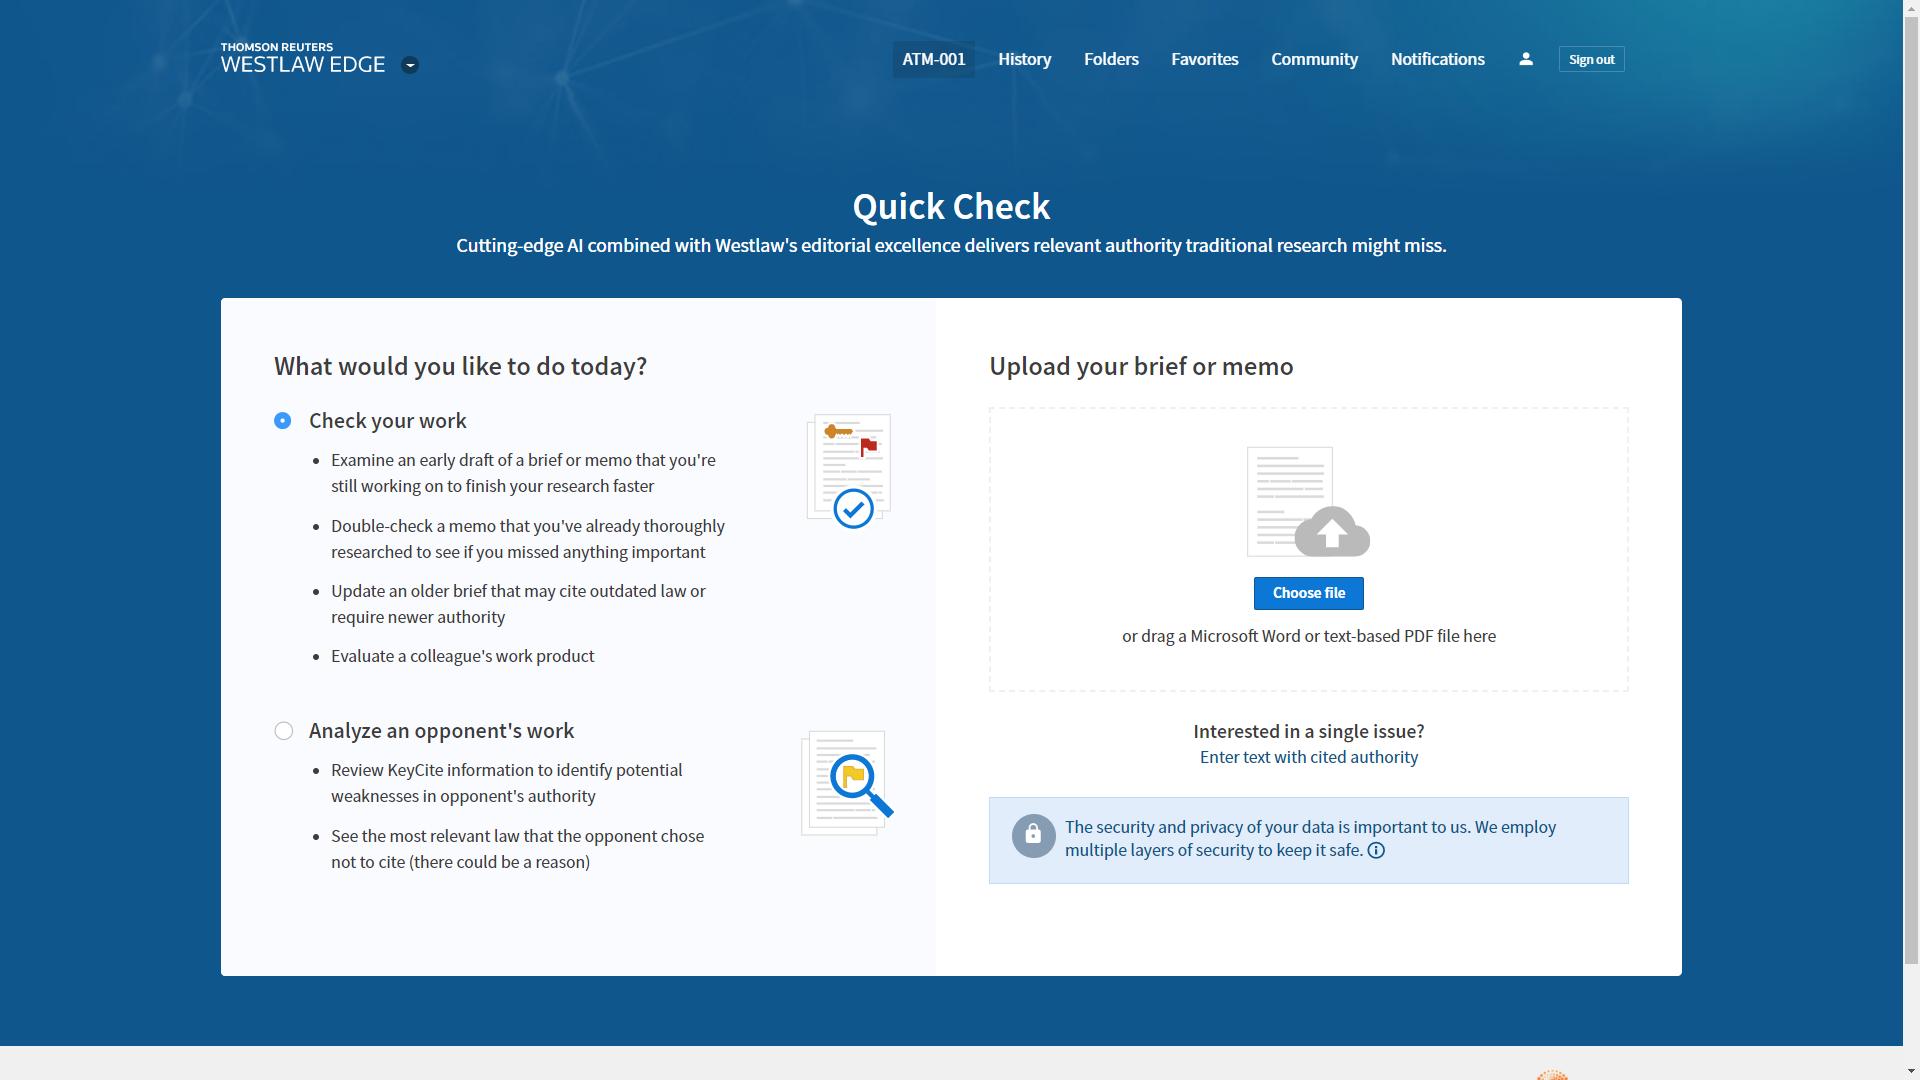 Quick_Check_-_Upload